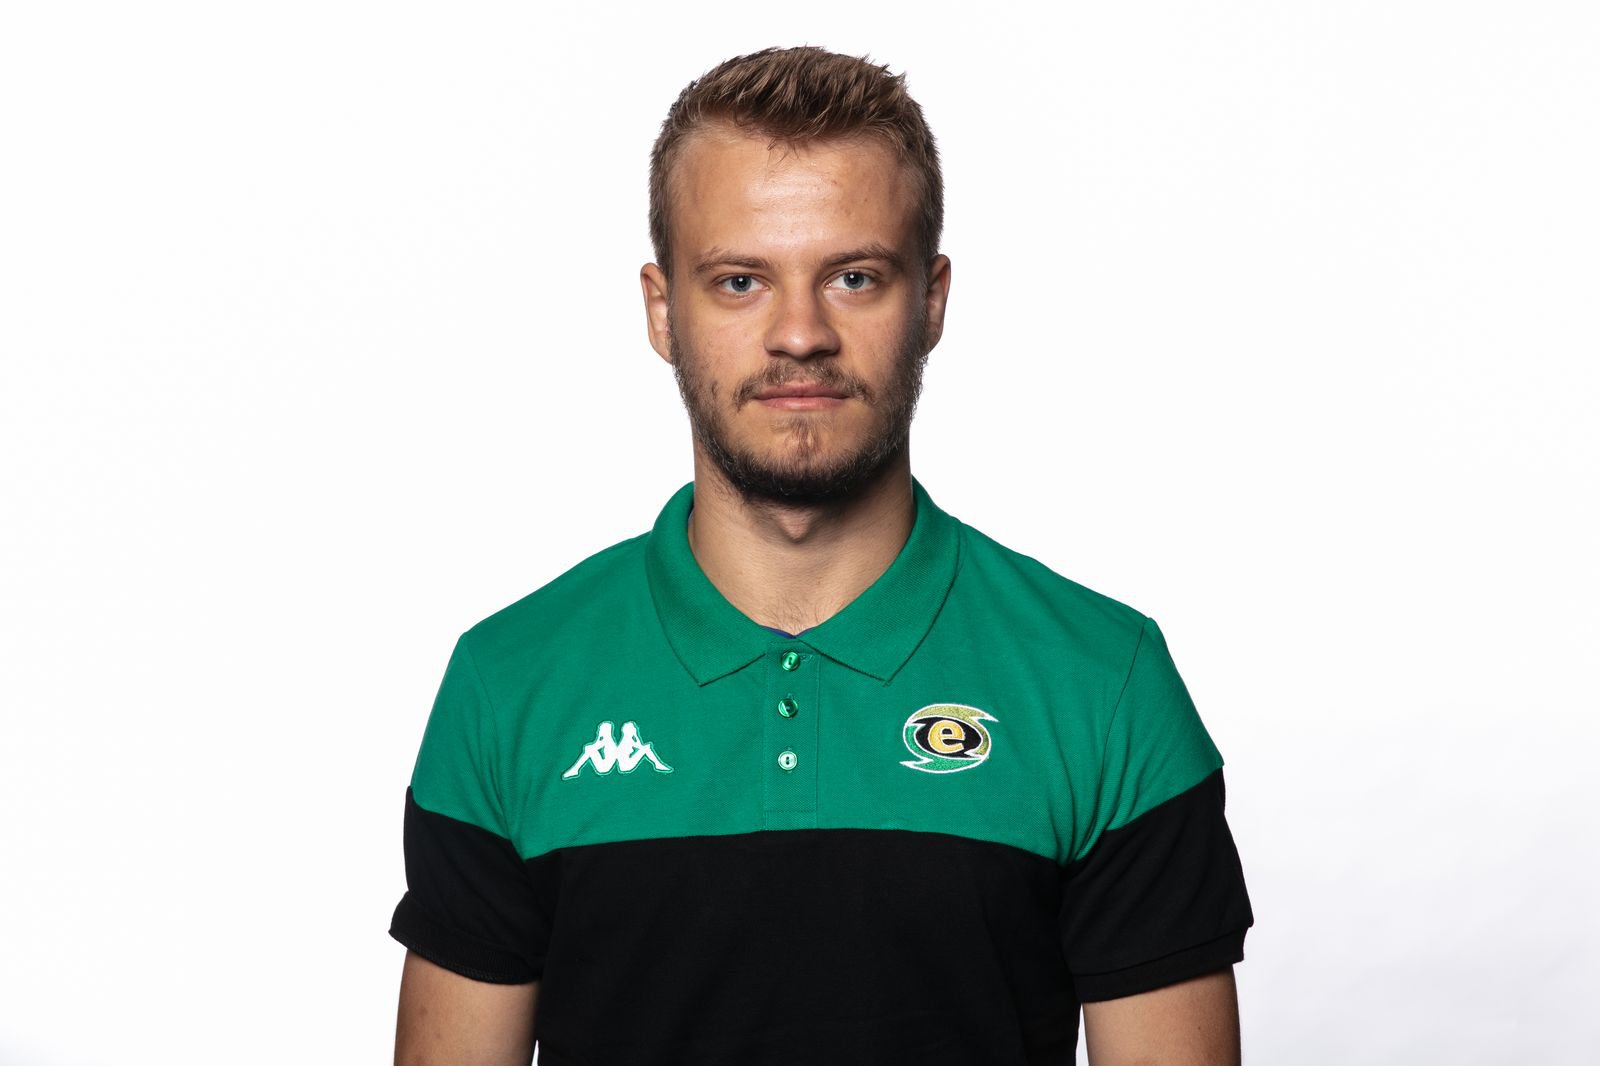 Tomáš Havránek